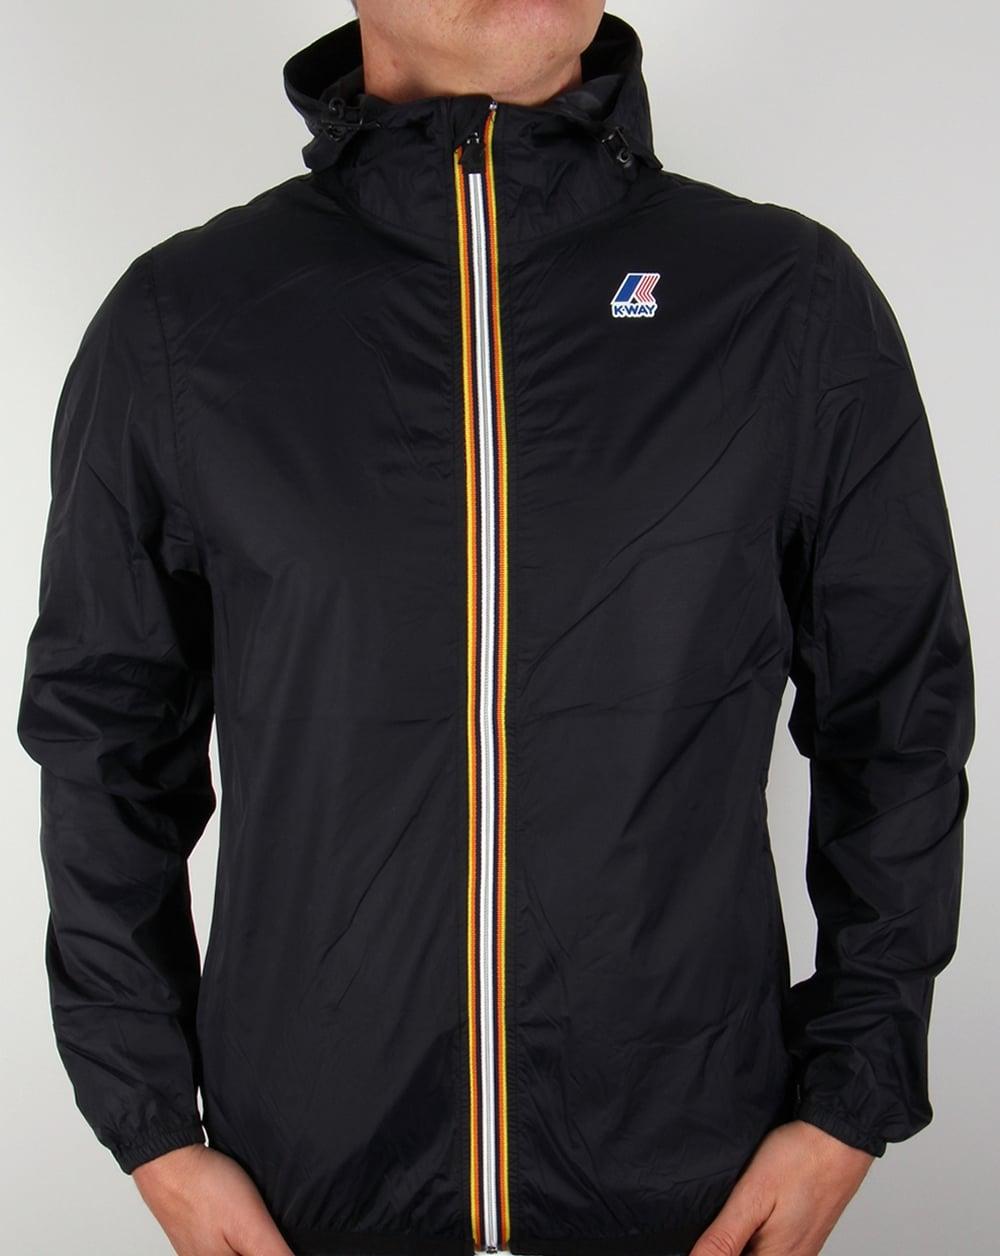 k way claude 3 0 rainproof jacket black windbreaker coat pac a mac full zip. Black Bedroom Furniture Sets. Home Design Ideas